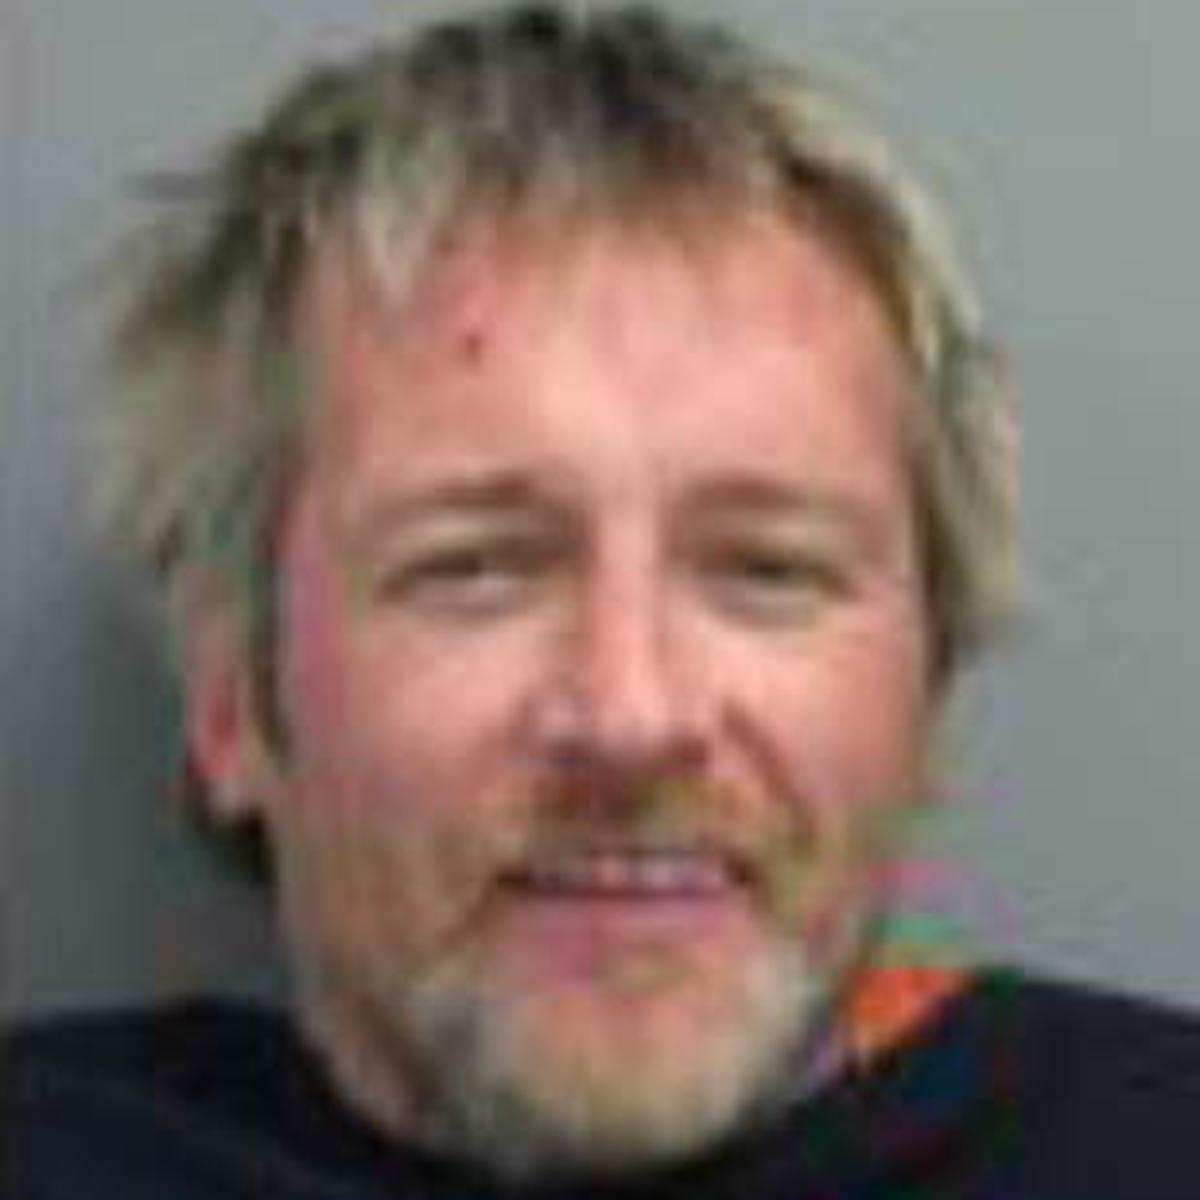 Thacker pleads guilty, sentenced in death of man whose body